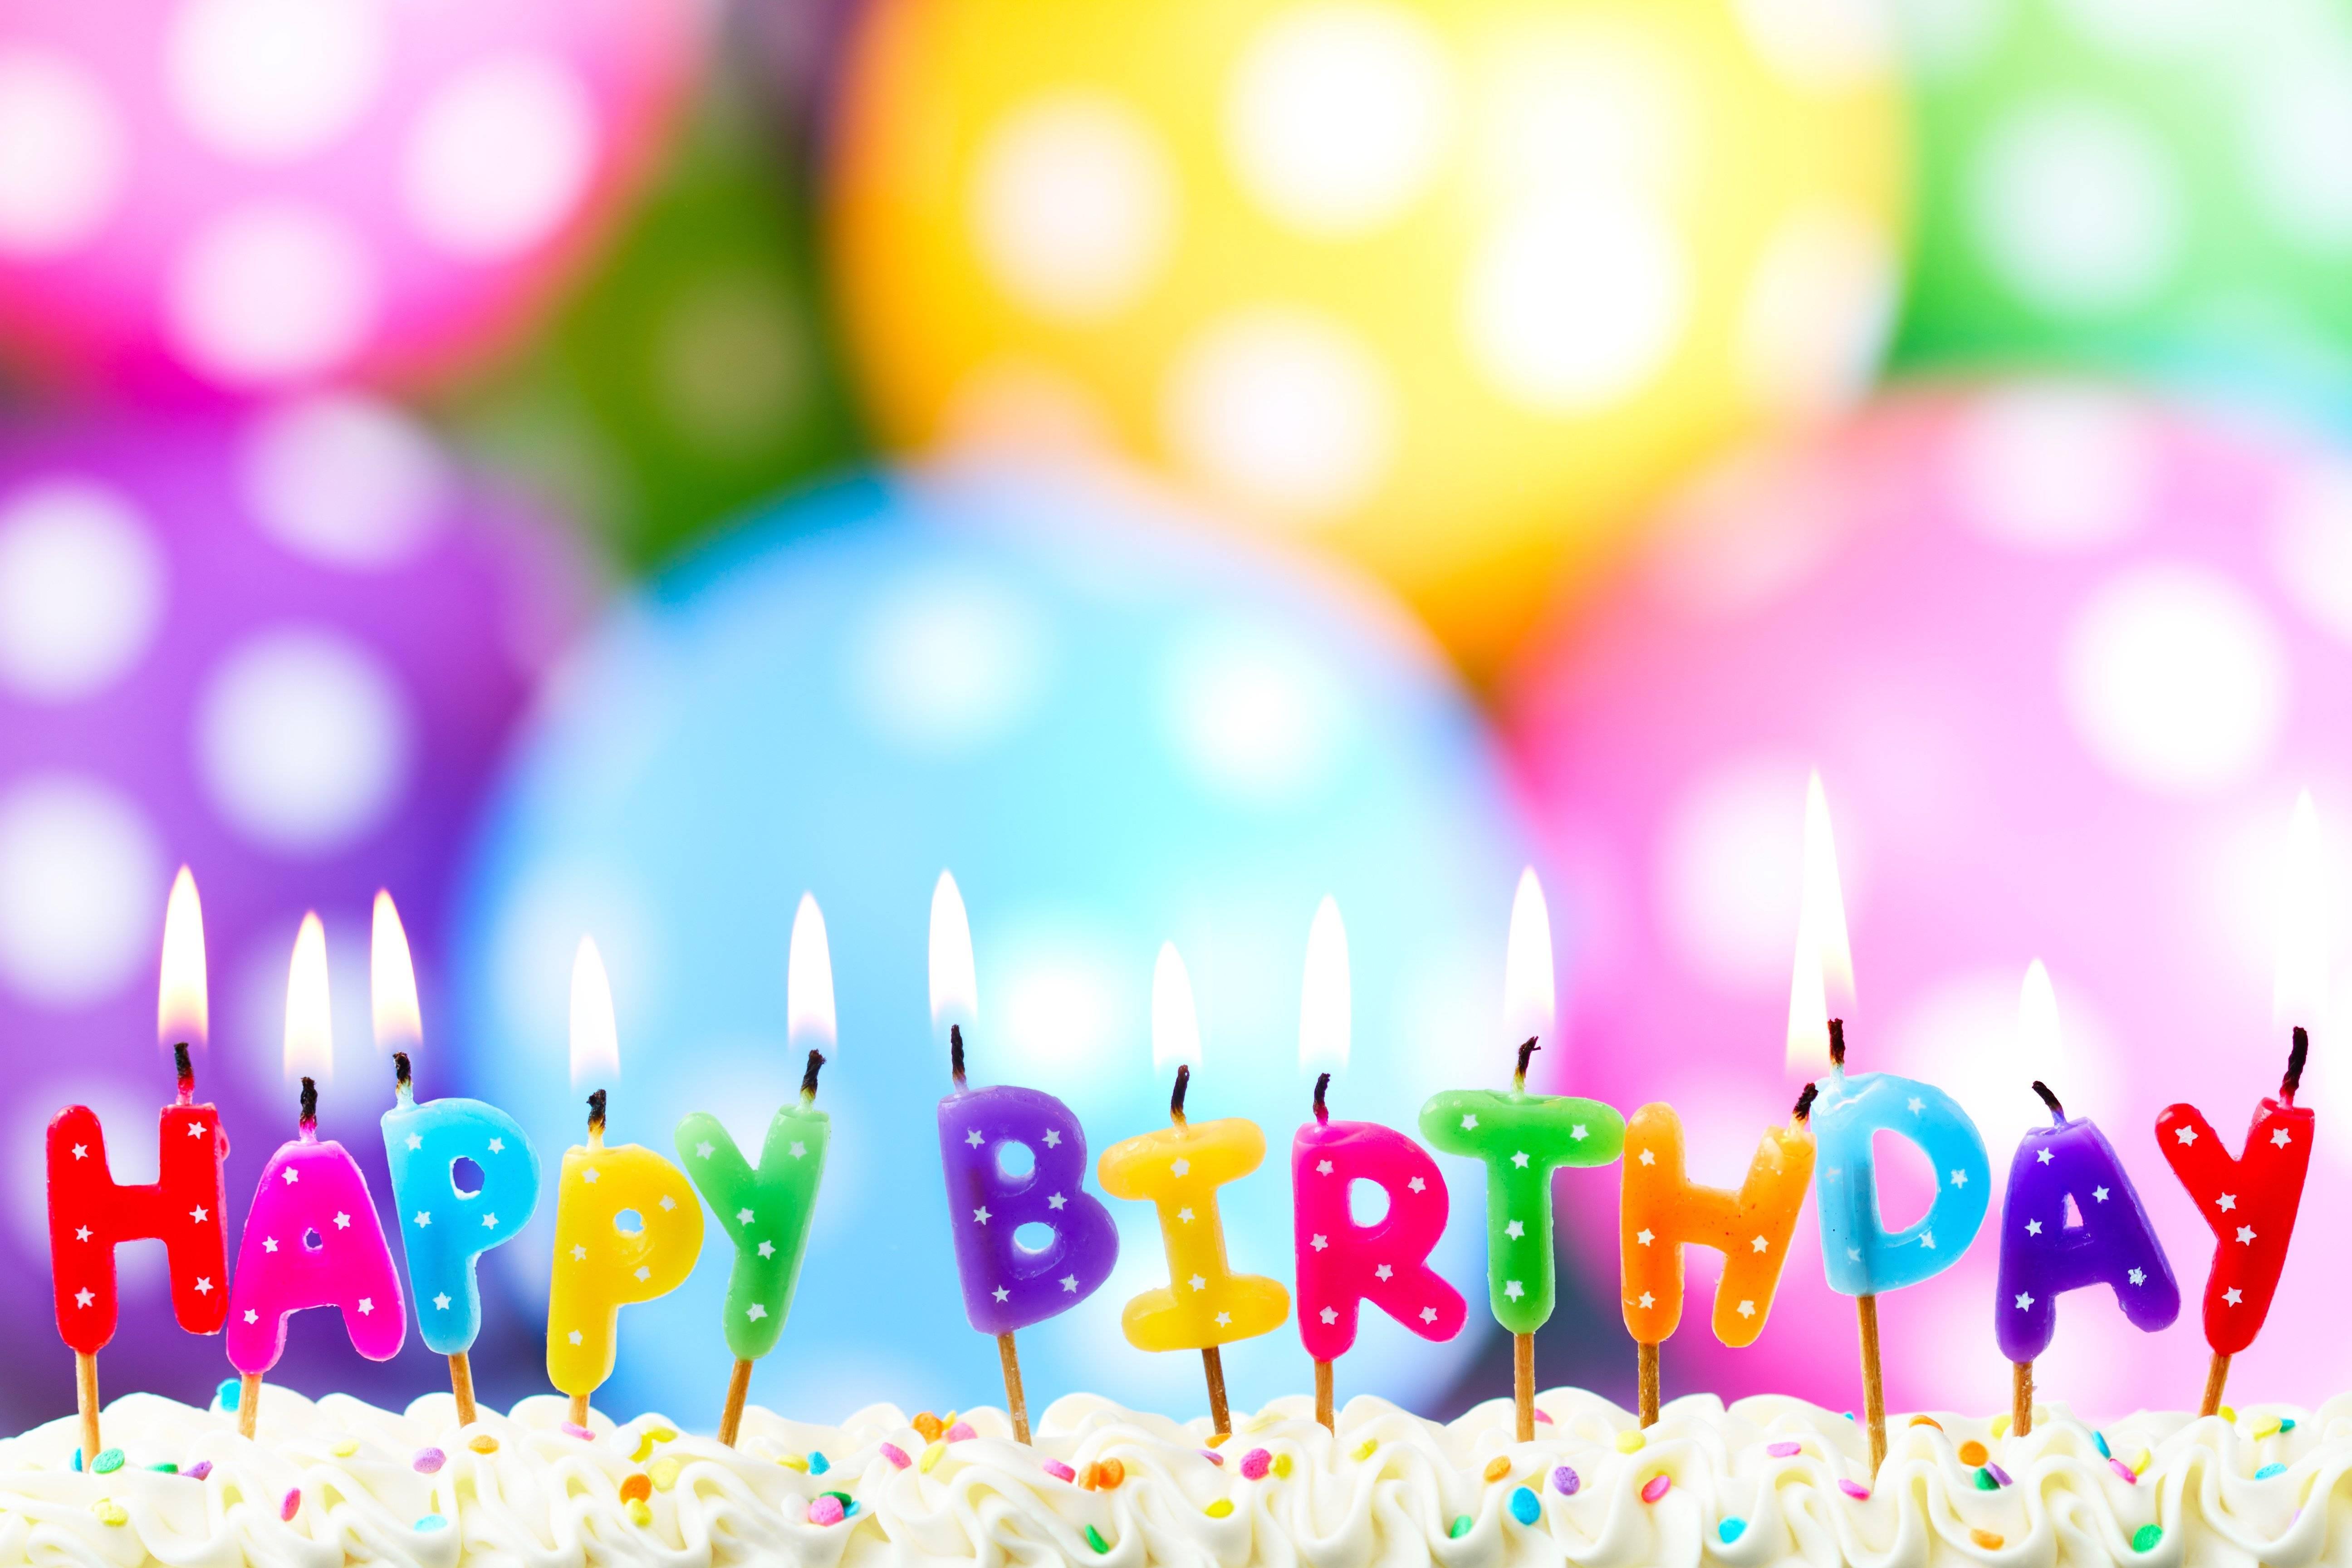 Happy Birthday Backgrounds Image 5184x3456